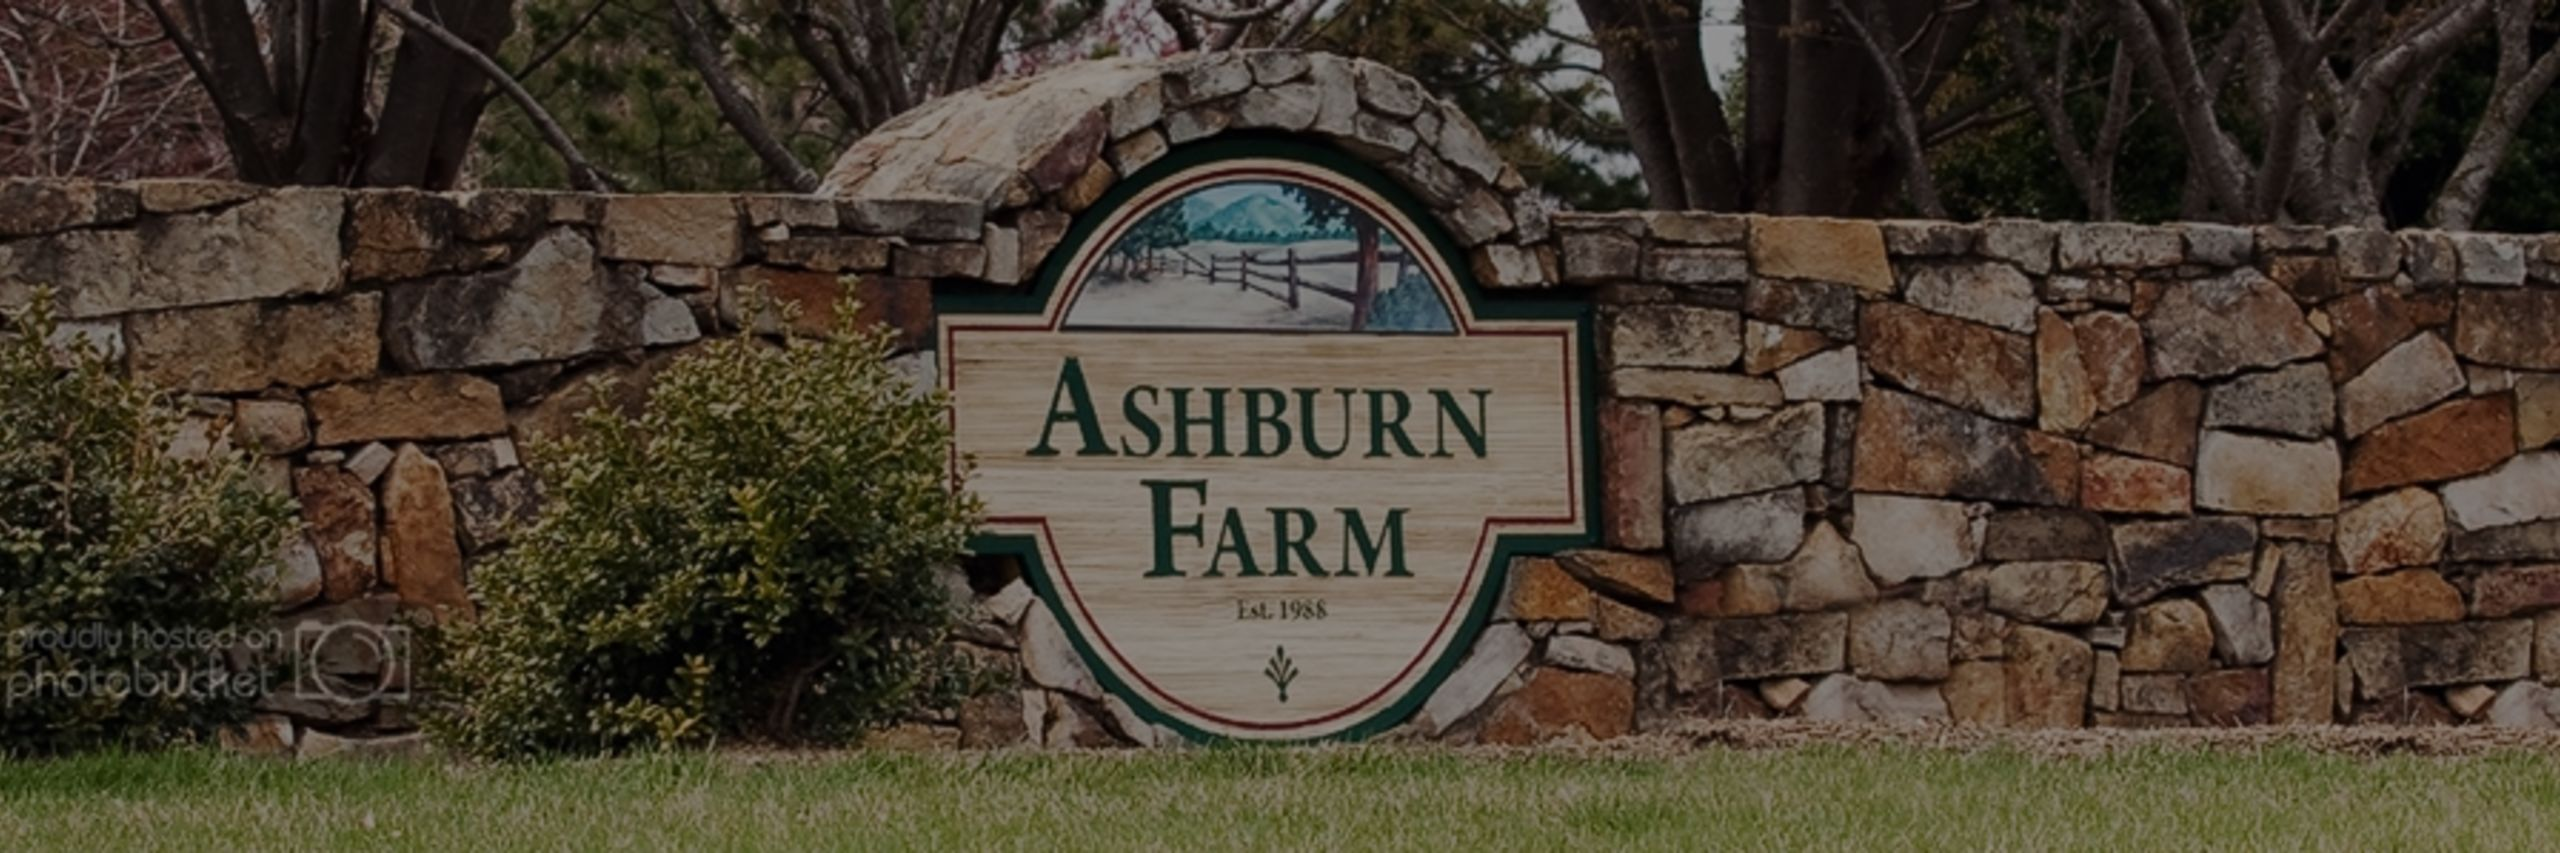 Neighborhood Profile: Ashburn Farm